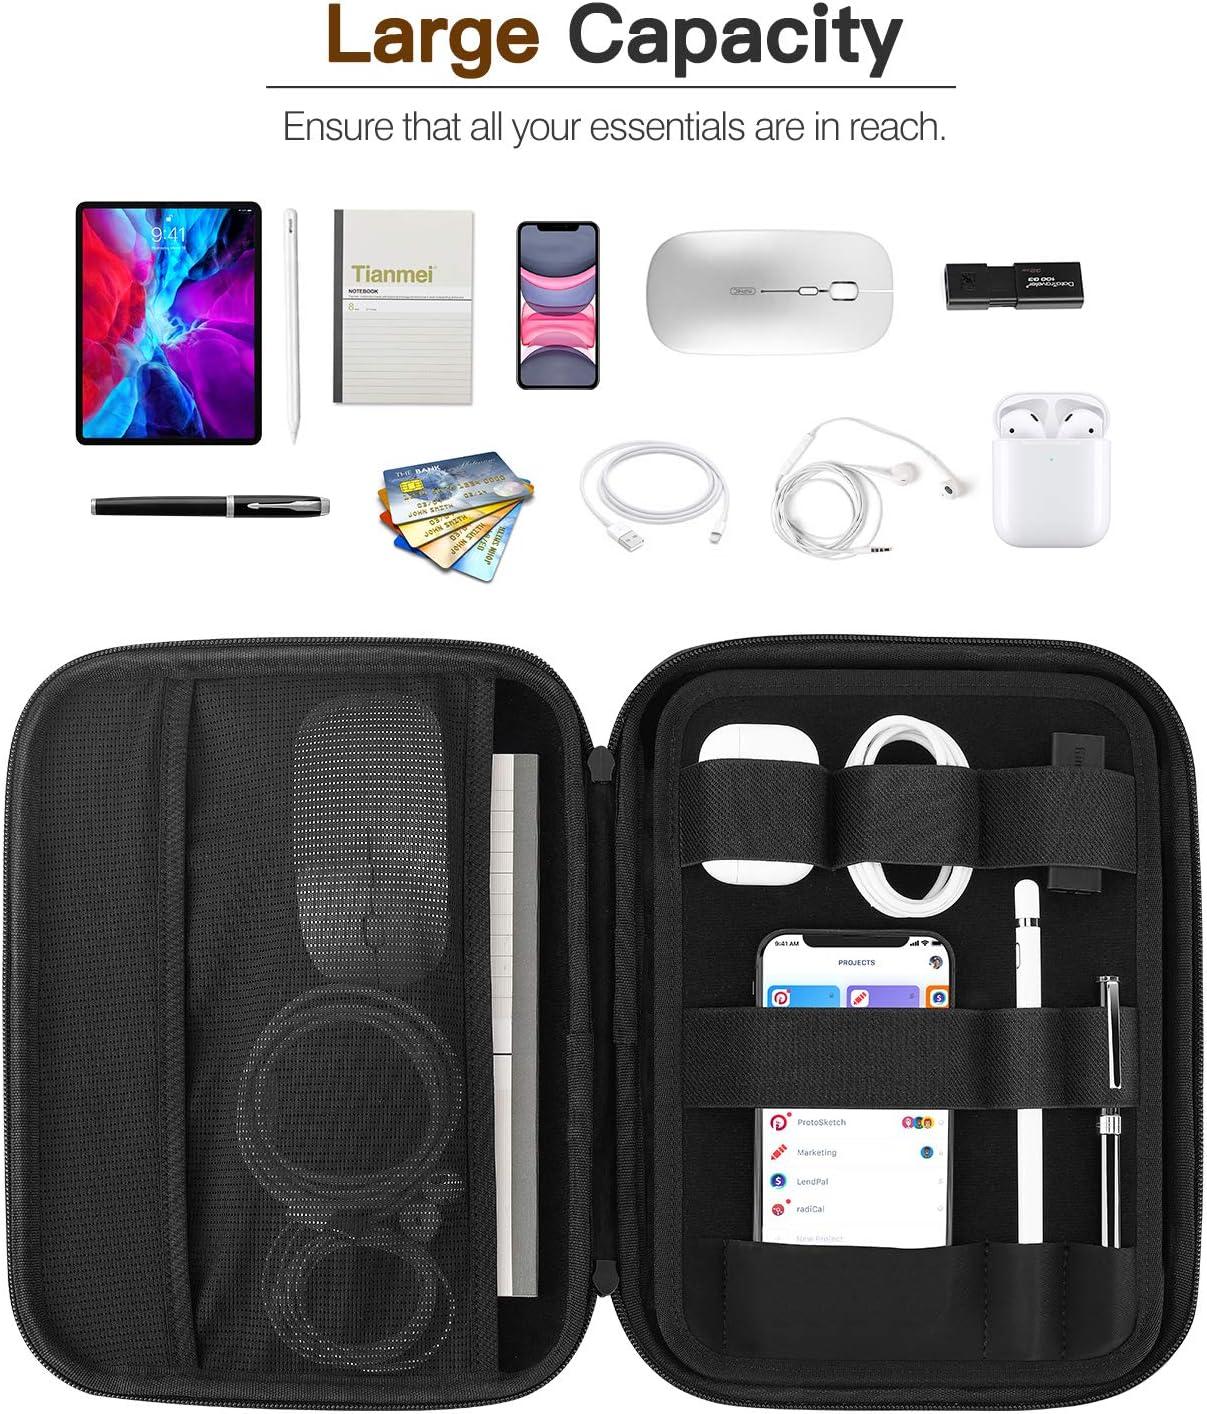 Galaxy Tab A 10.1 Hard EVA Carrying Business Portfolio Case Fits iPad Pro 11 Tab S6 Lite iPad 9.7 Air 3 10.5 MoKo 9-11 Inch Tablet Sleeve Bag iPad Air 4 10.9 S7 iPad 8th 7th Generation 10.2